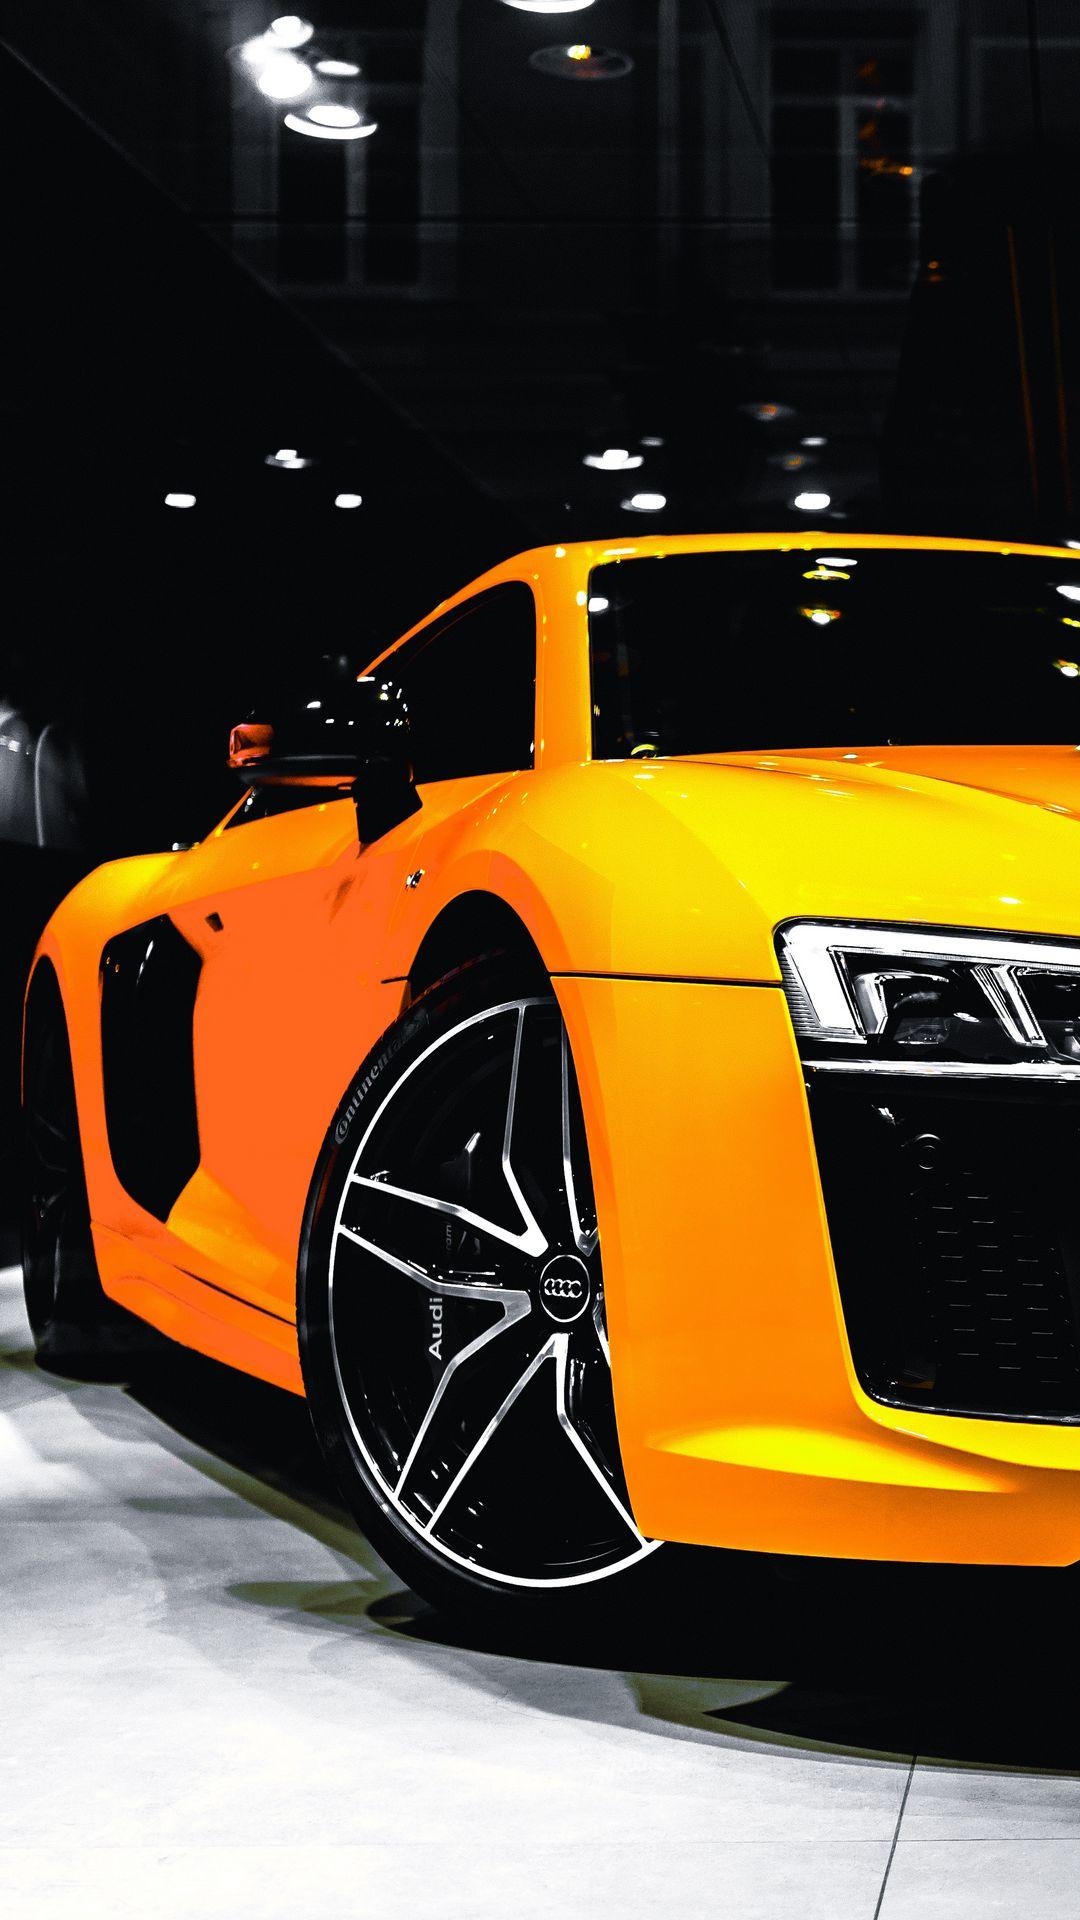 Audi R8 Full HD Wallpapers Free Download